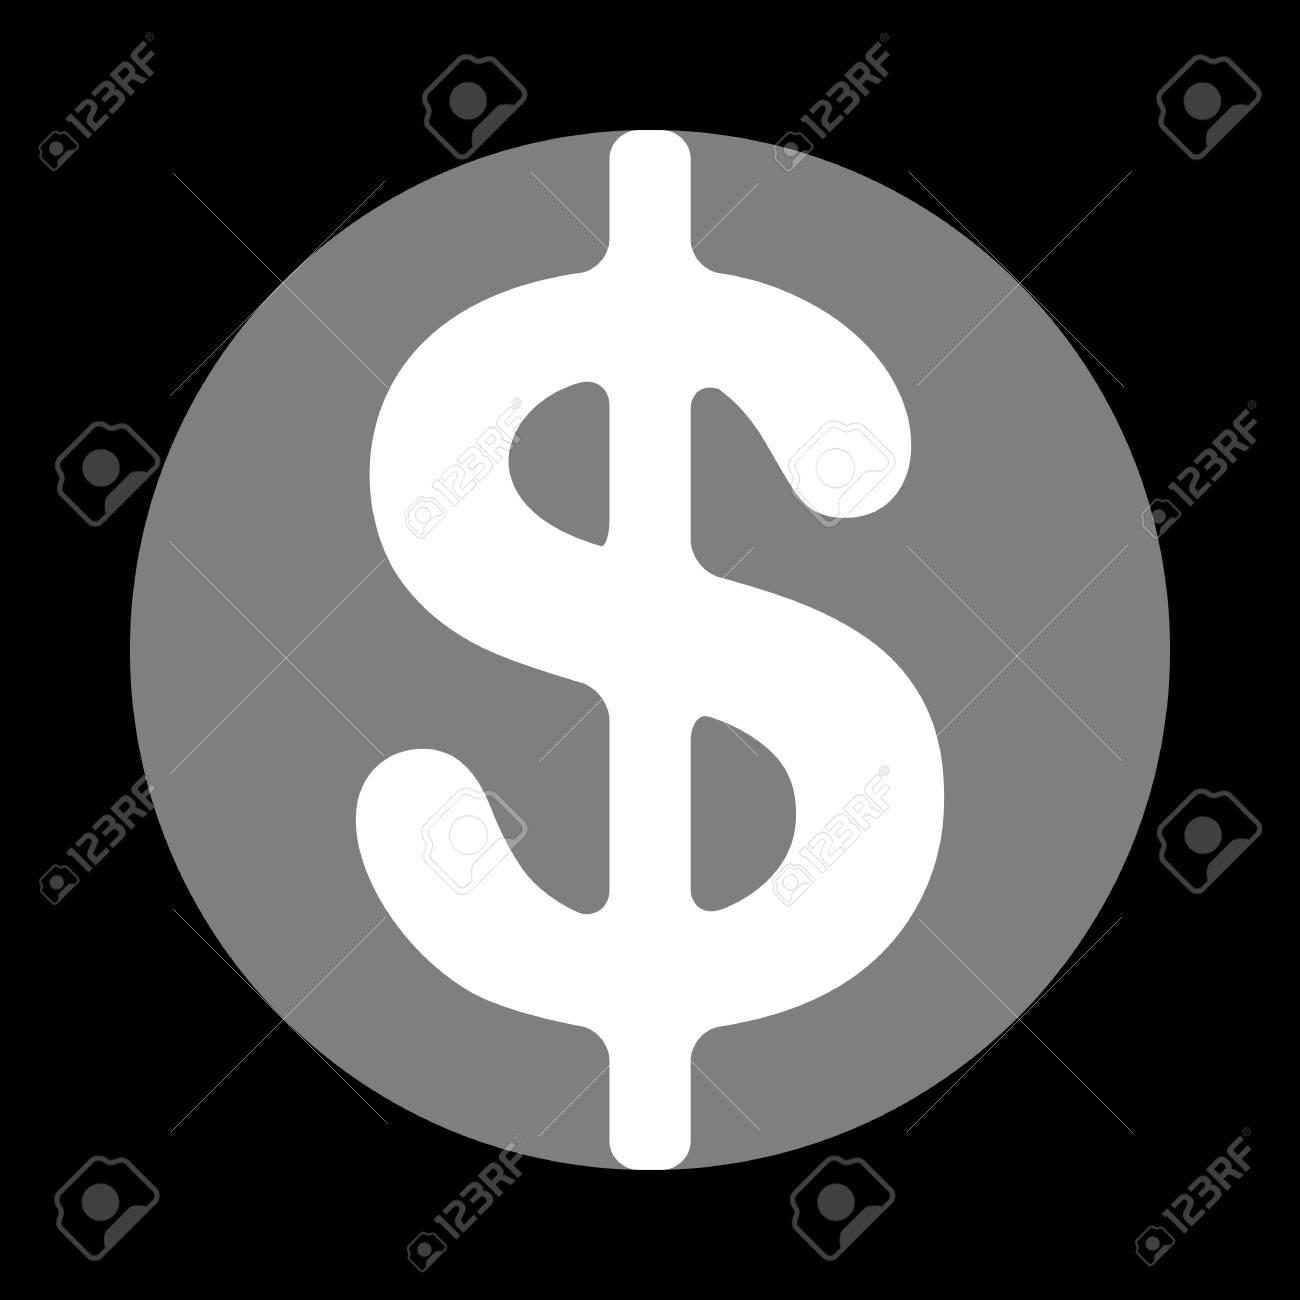 Dollars Sign Illustration Usd Currency Symbol Money Label